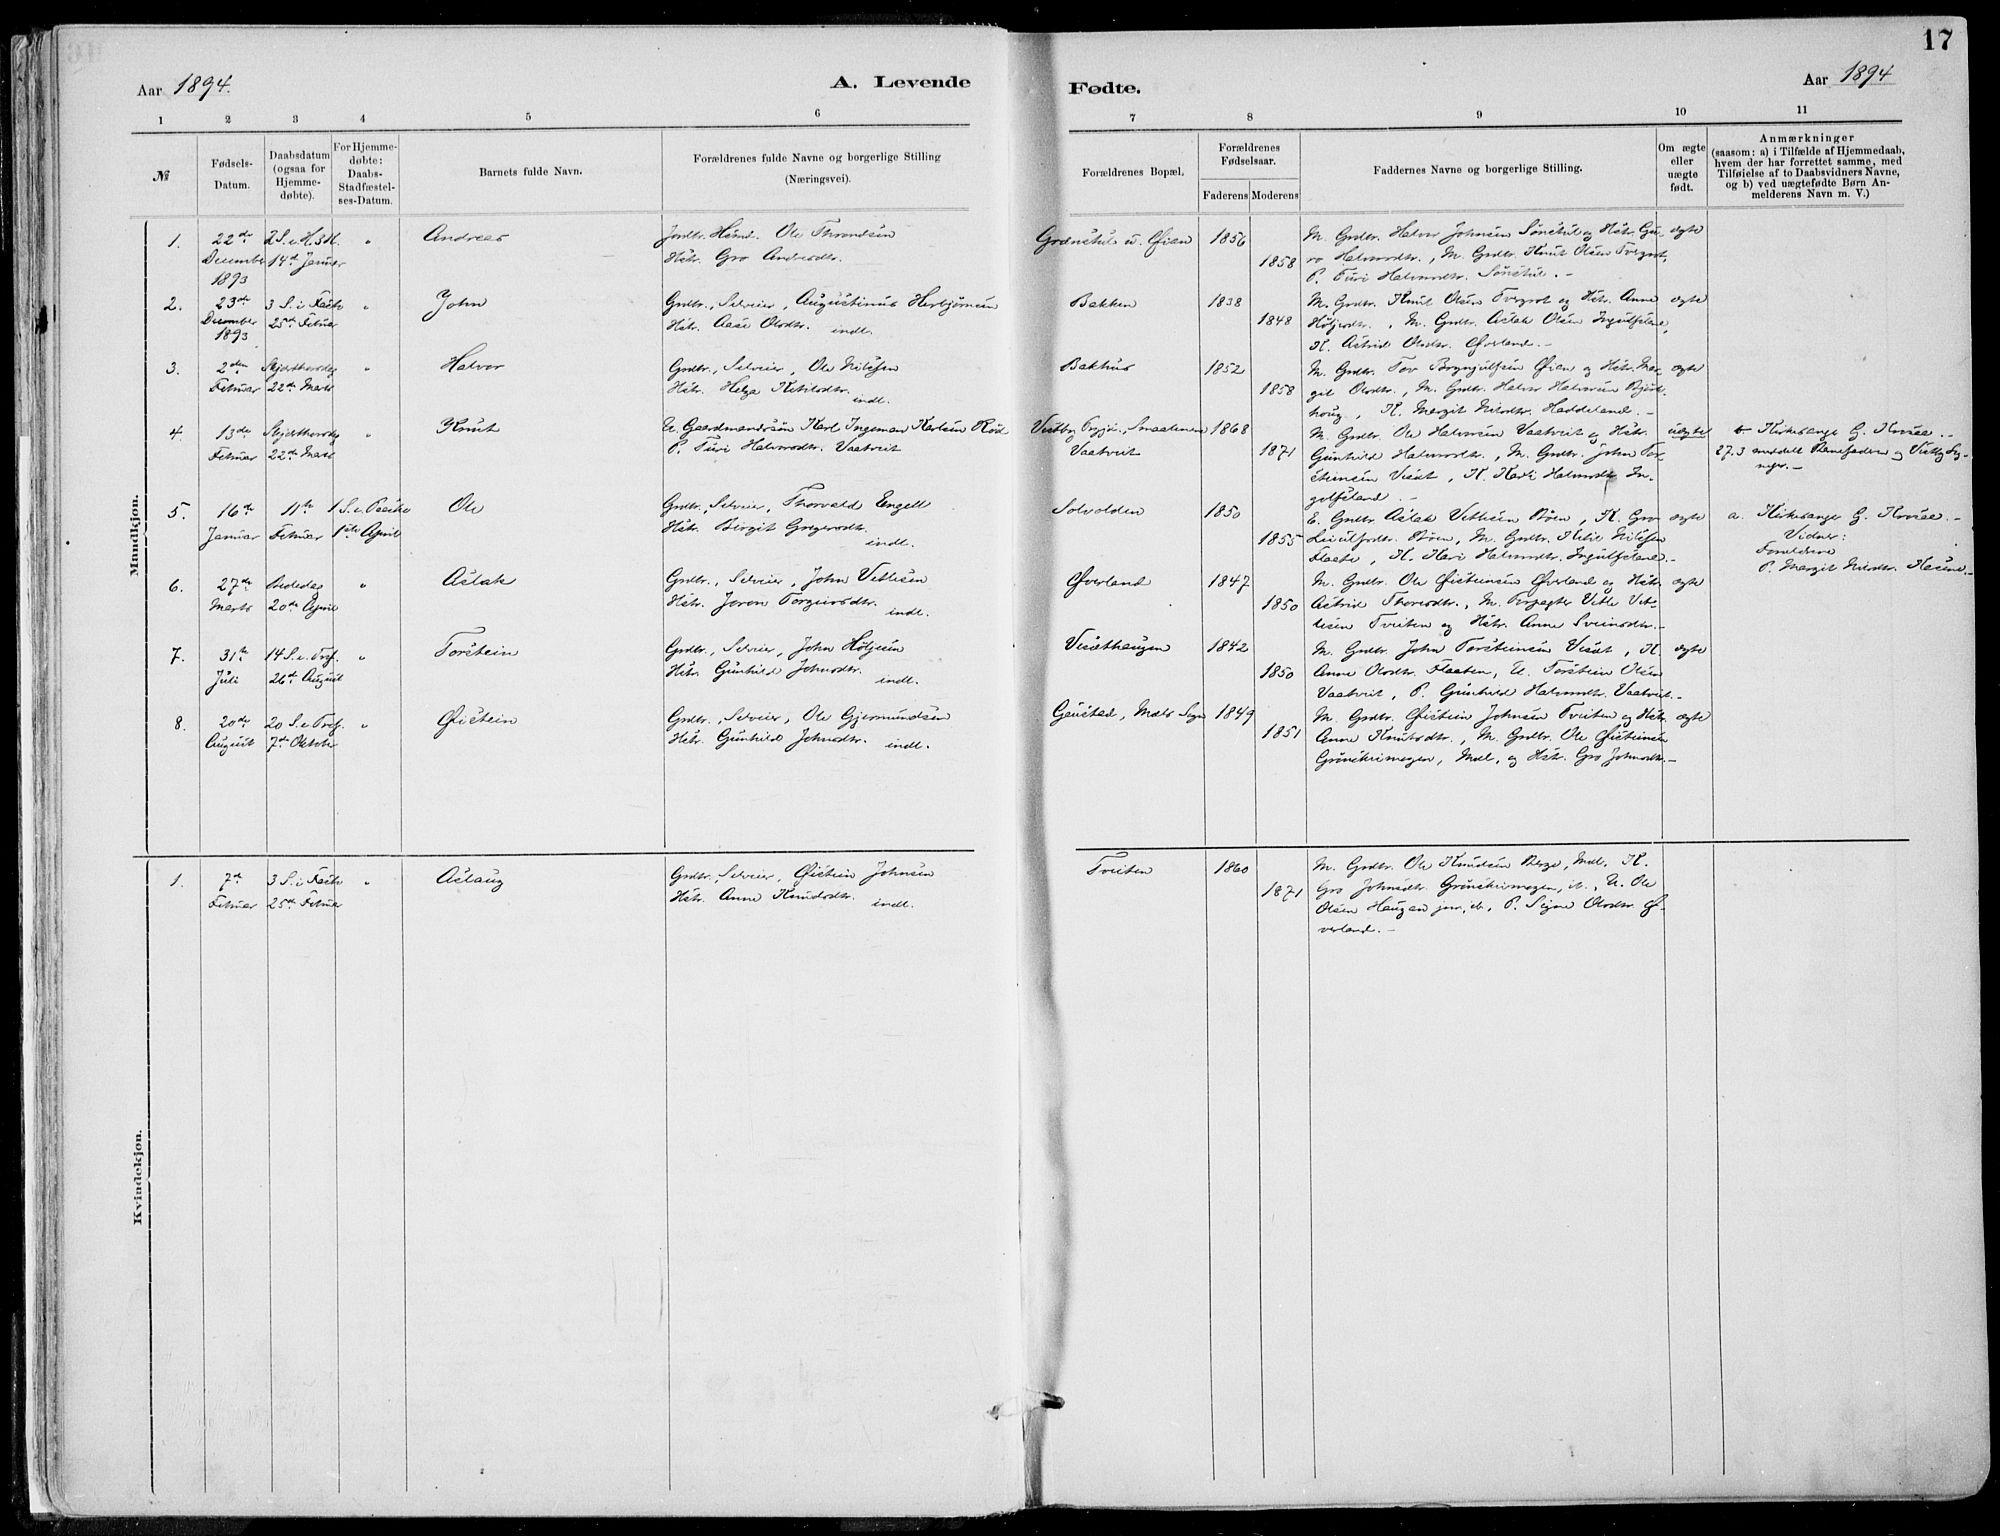 SAKO, Rjukan kirkebøker, F/Fa/L0001: Ministerialbok nr. 1, 1878-1912, s. 17